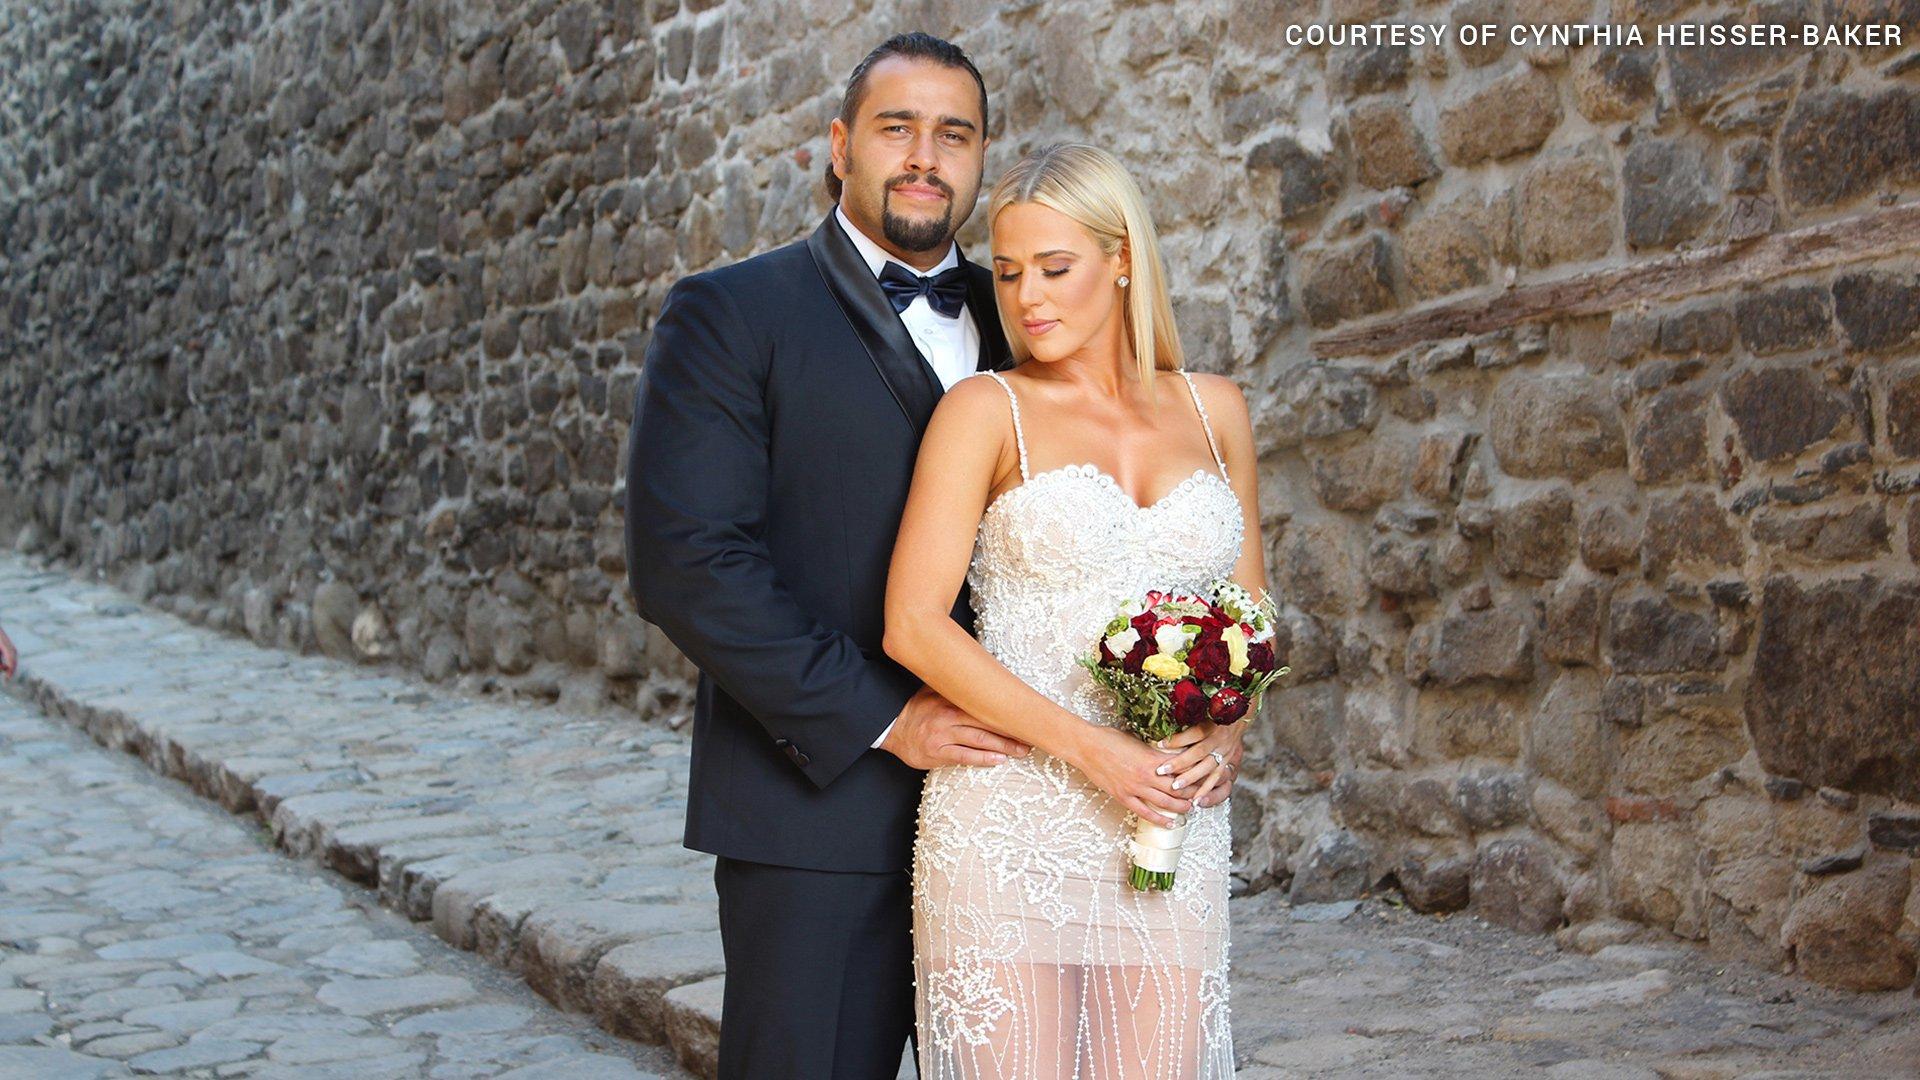 Lana and Rusev's Bulgarian wedding: photos